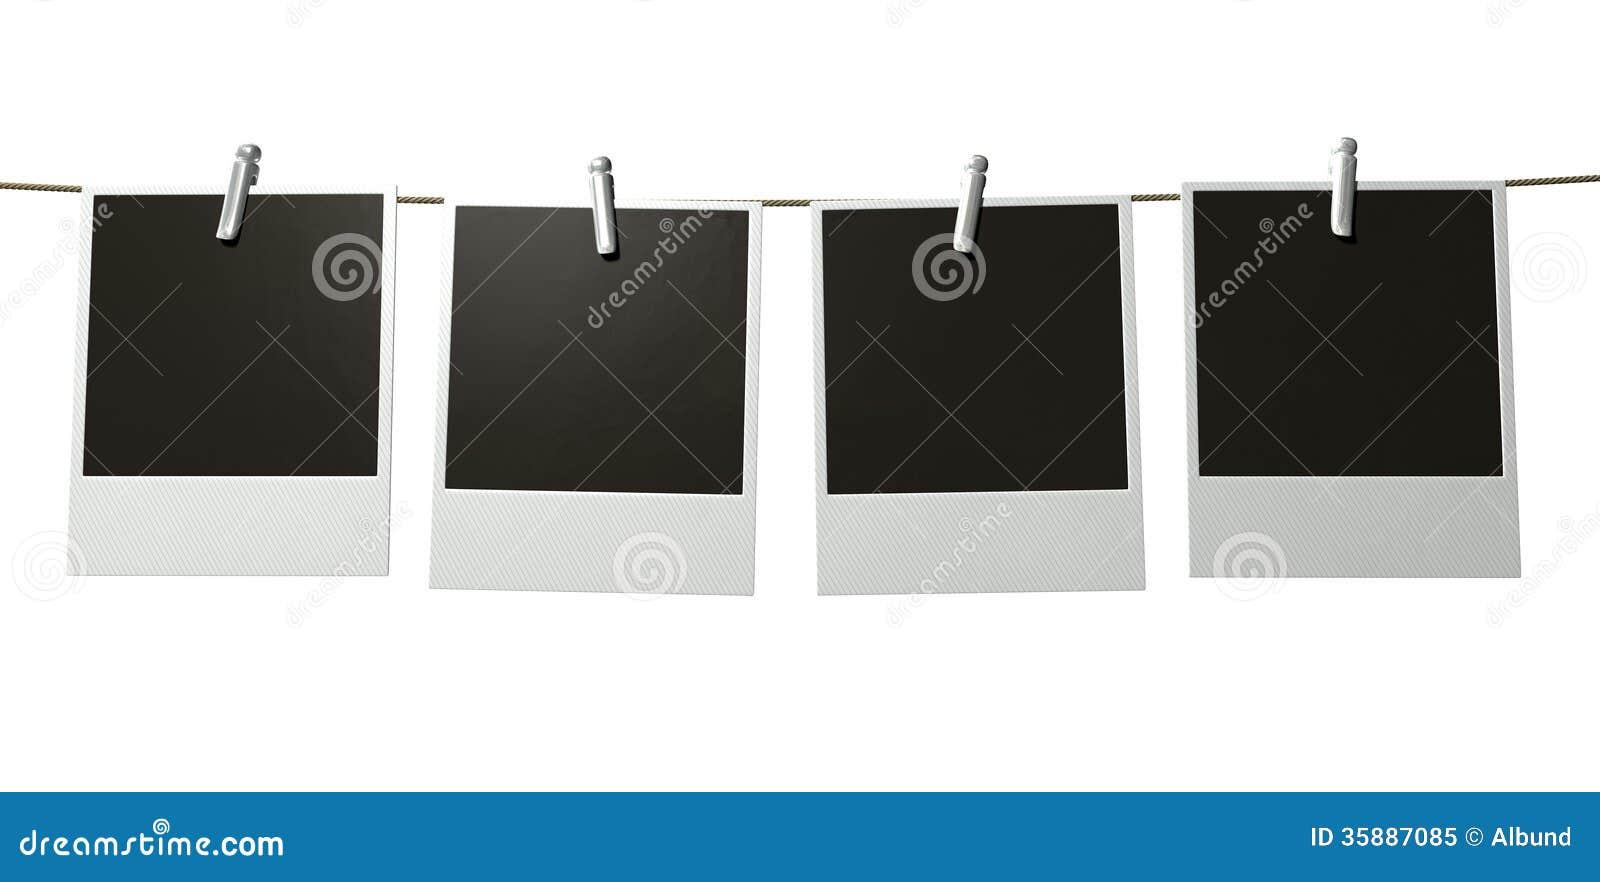 hanging polaroid gallery stock image image of blank 35887085. Black Bedroom Furniture Sets. Home Design Ideas